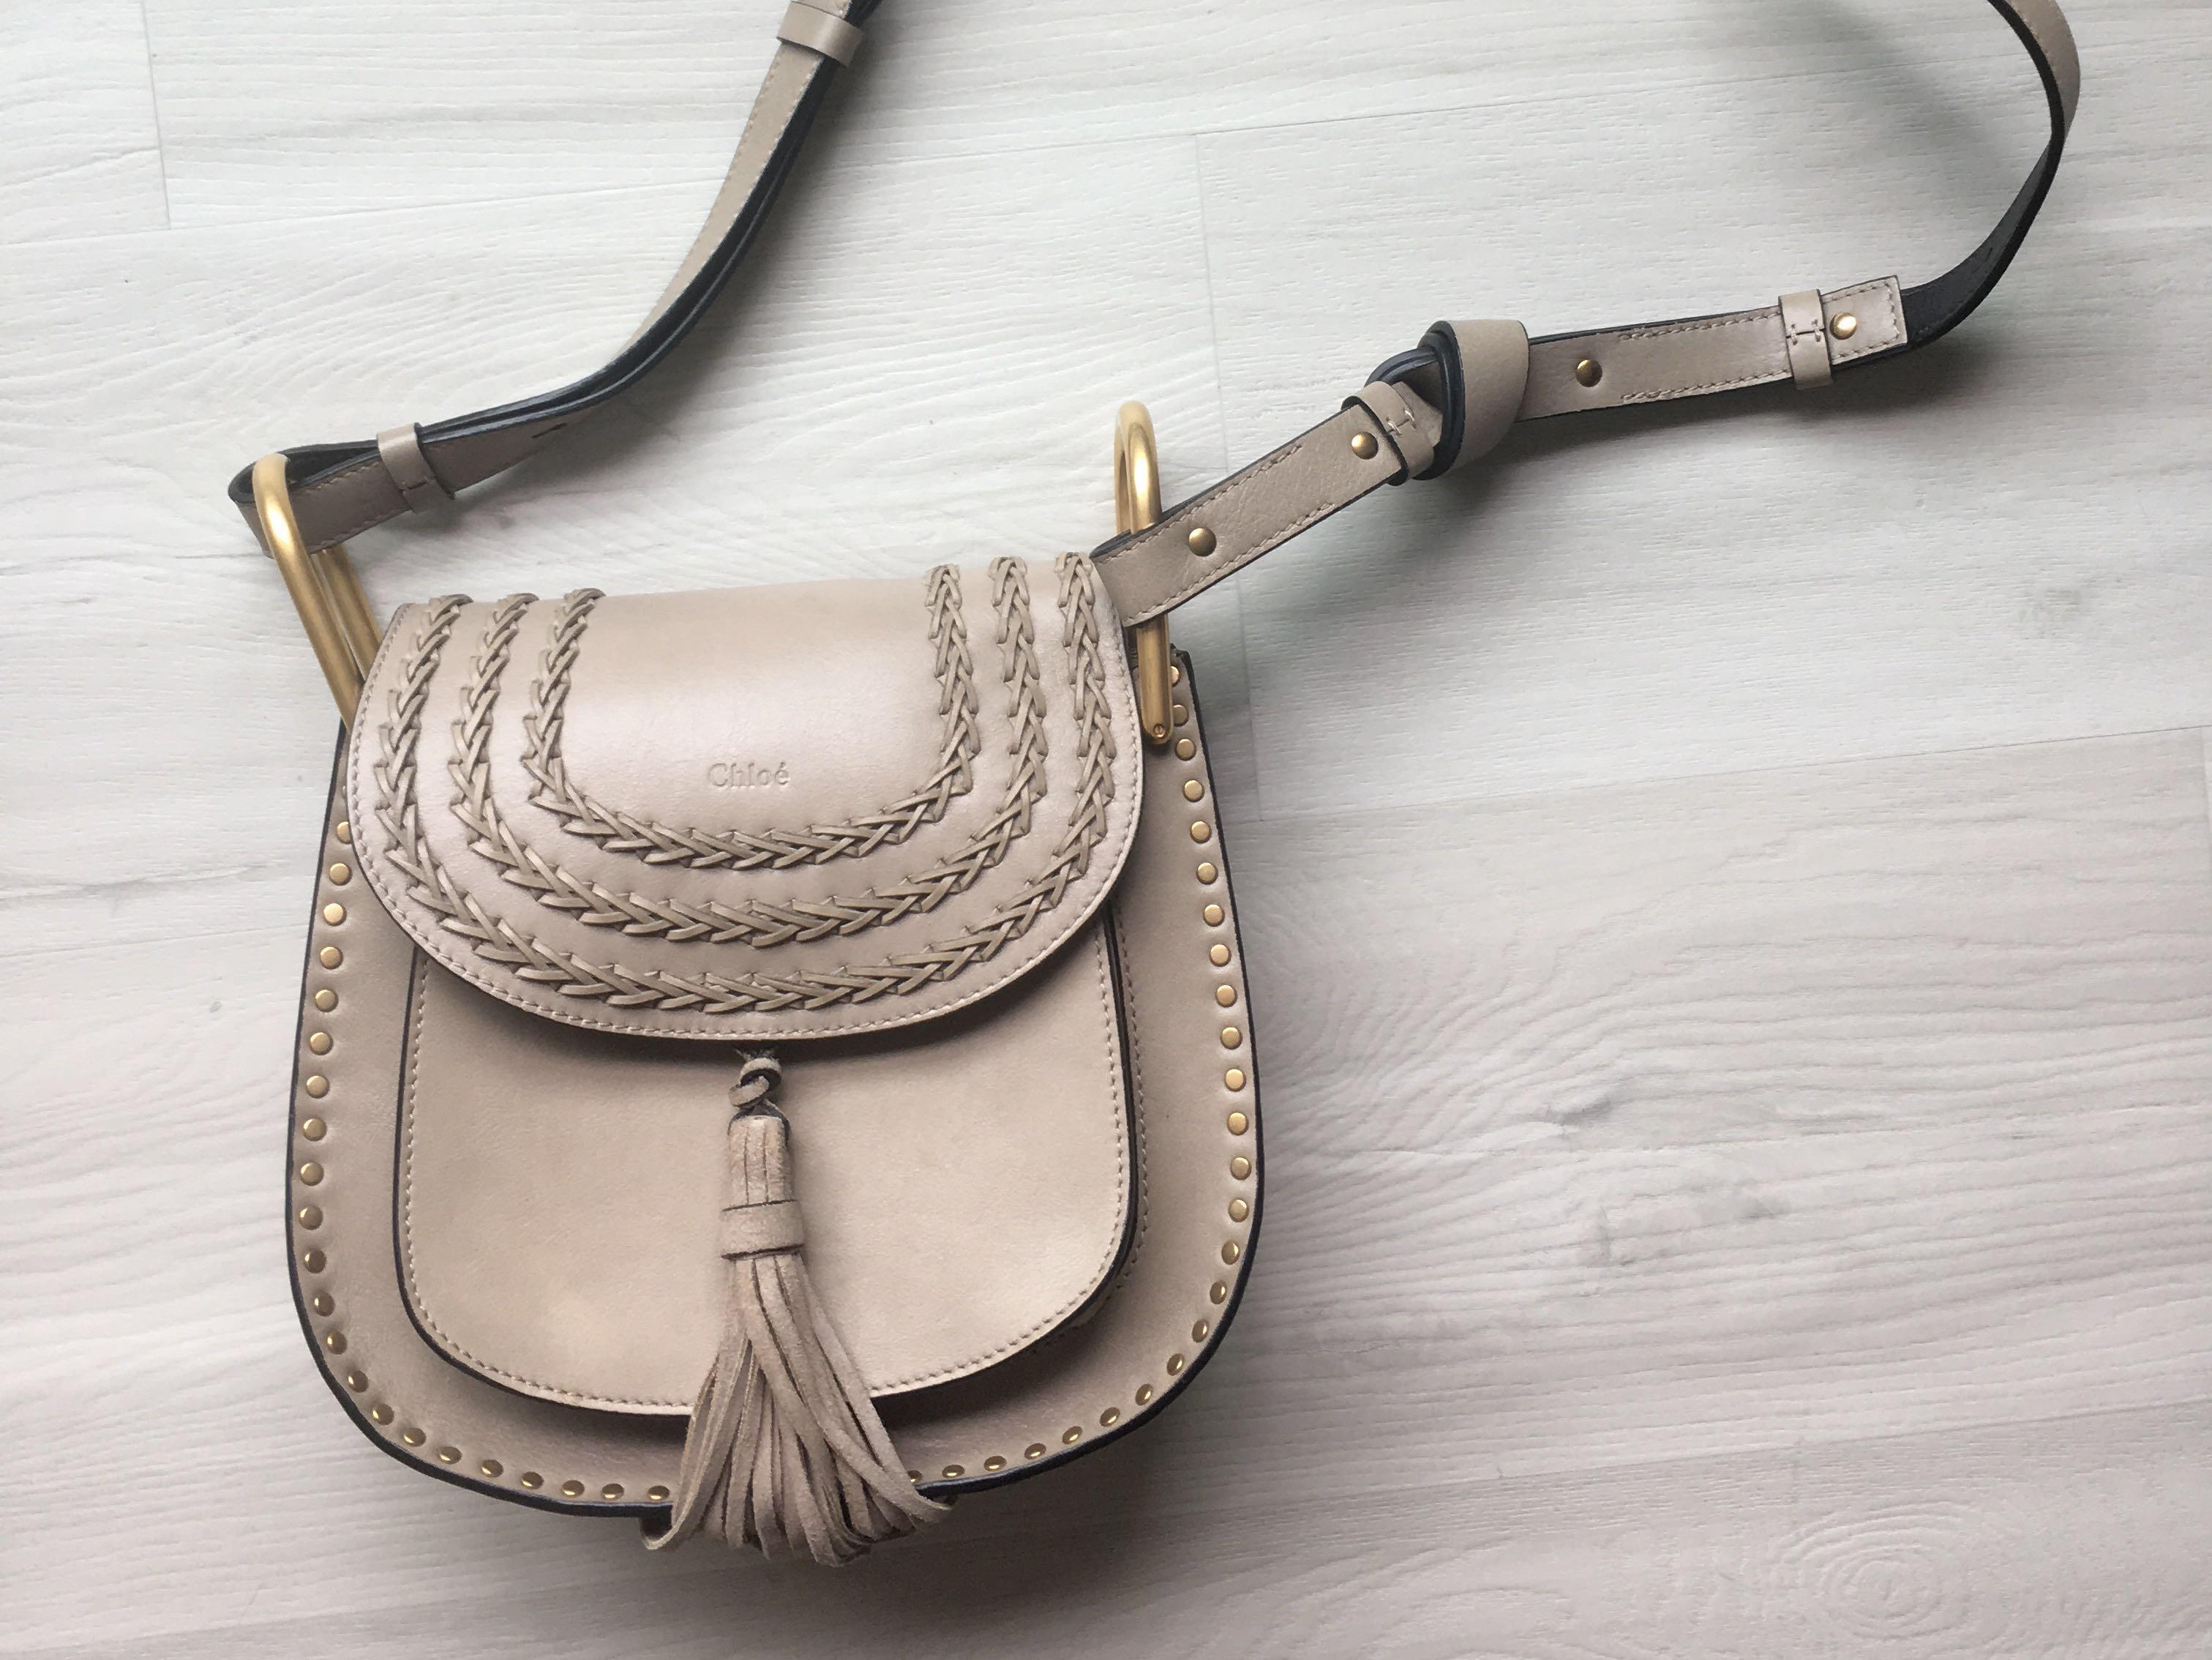 018804b35 Chloe Hudson small bag, Luxury, Bags & Wallets, Handbags on Carousell